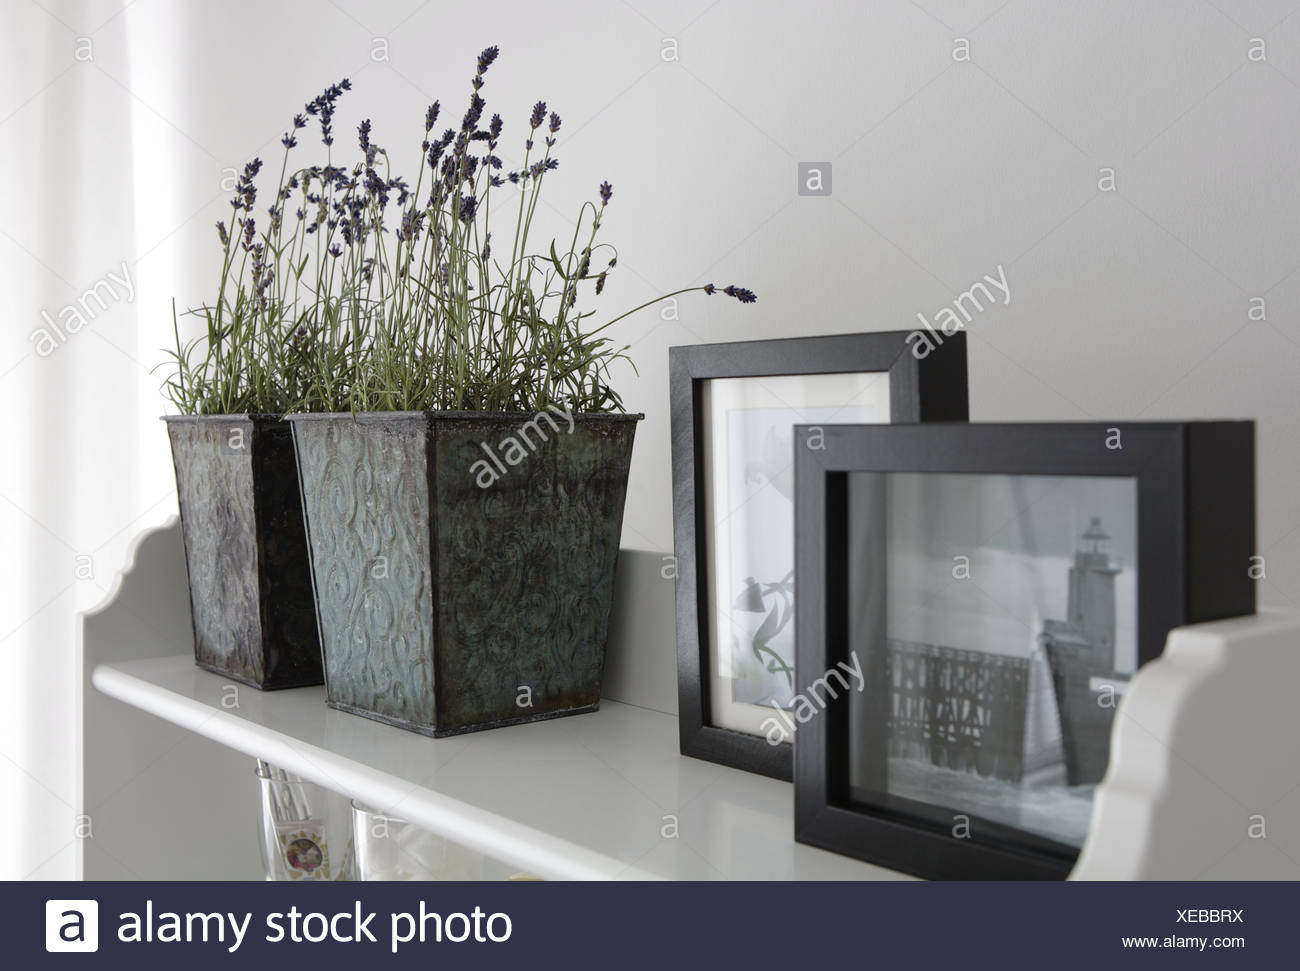 Picture Frames Shelf Stockfotos & Picture Frames Shelf Bilder - Alamy